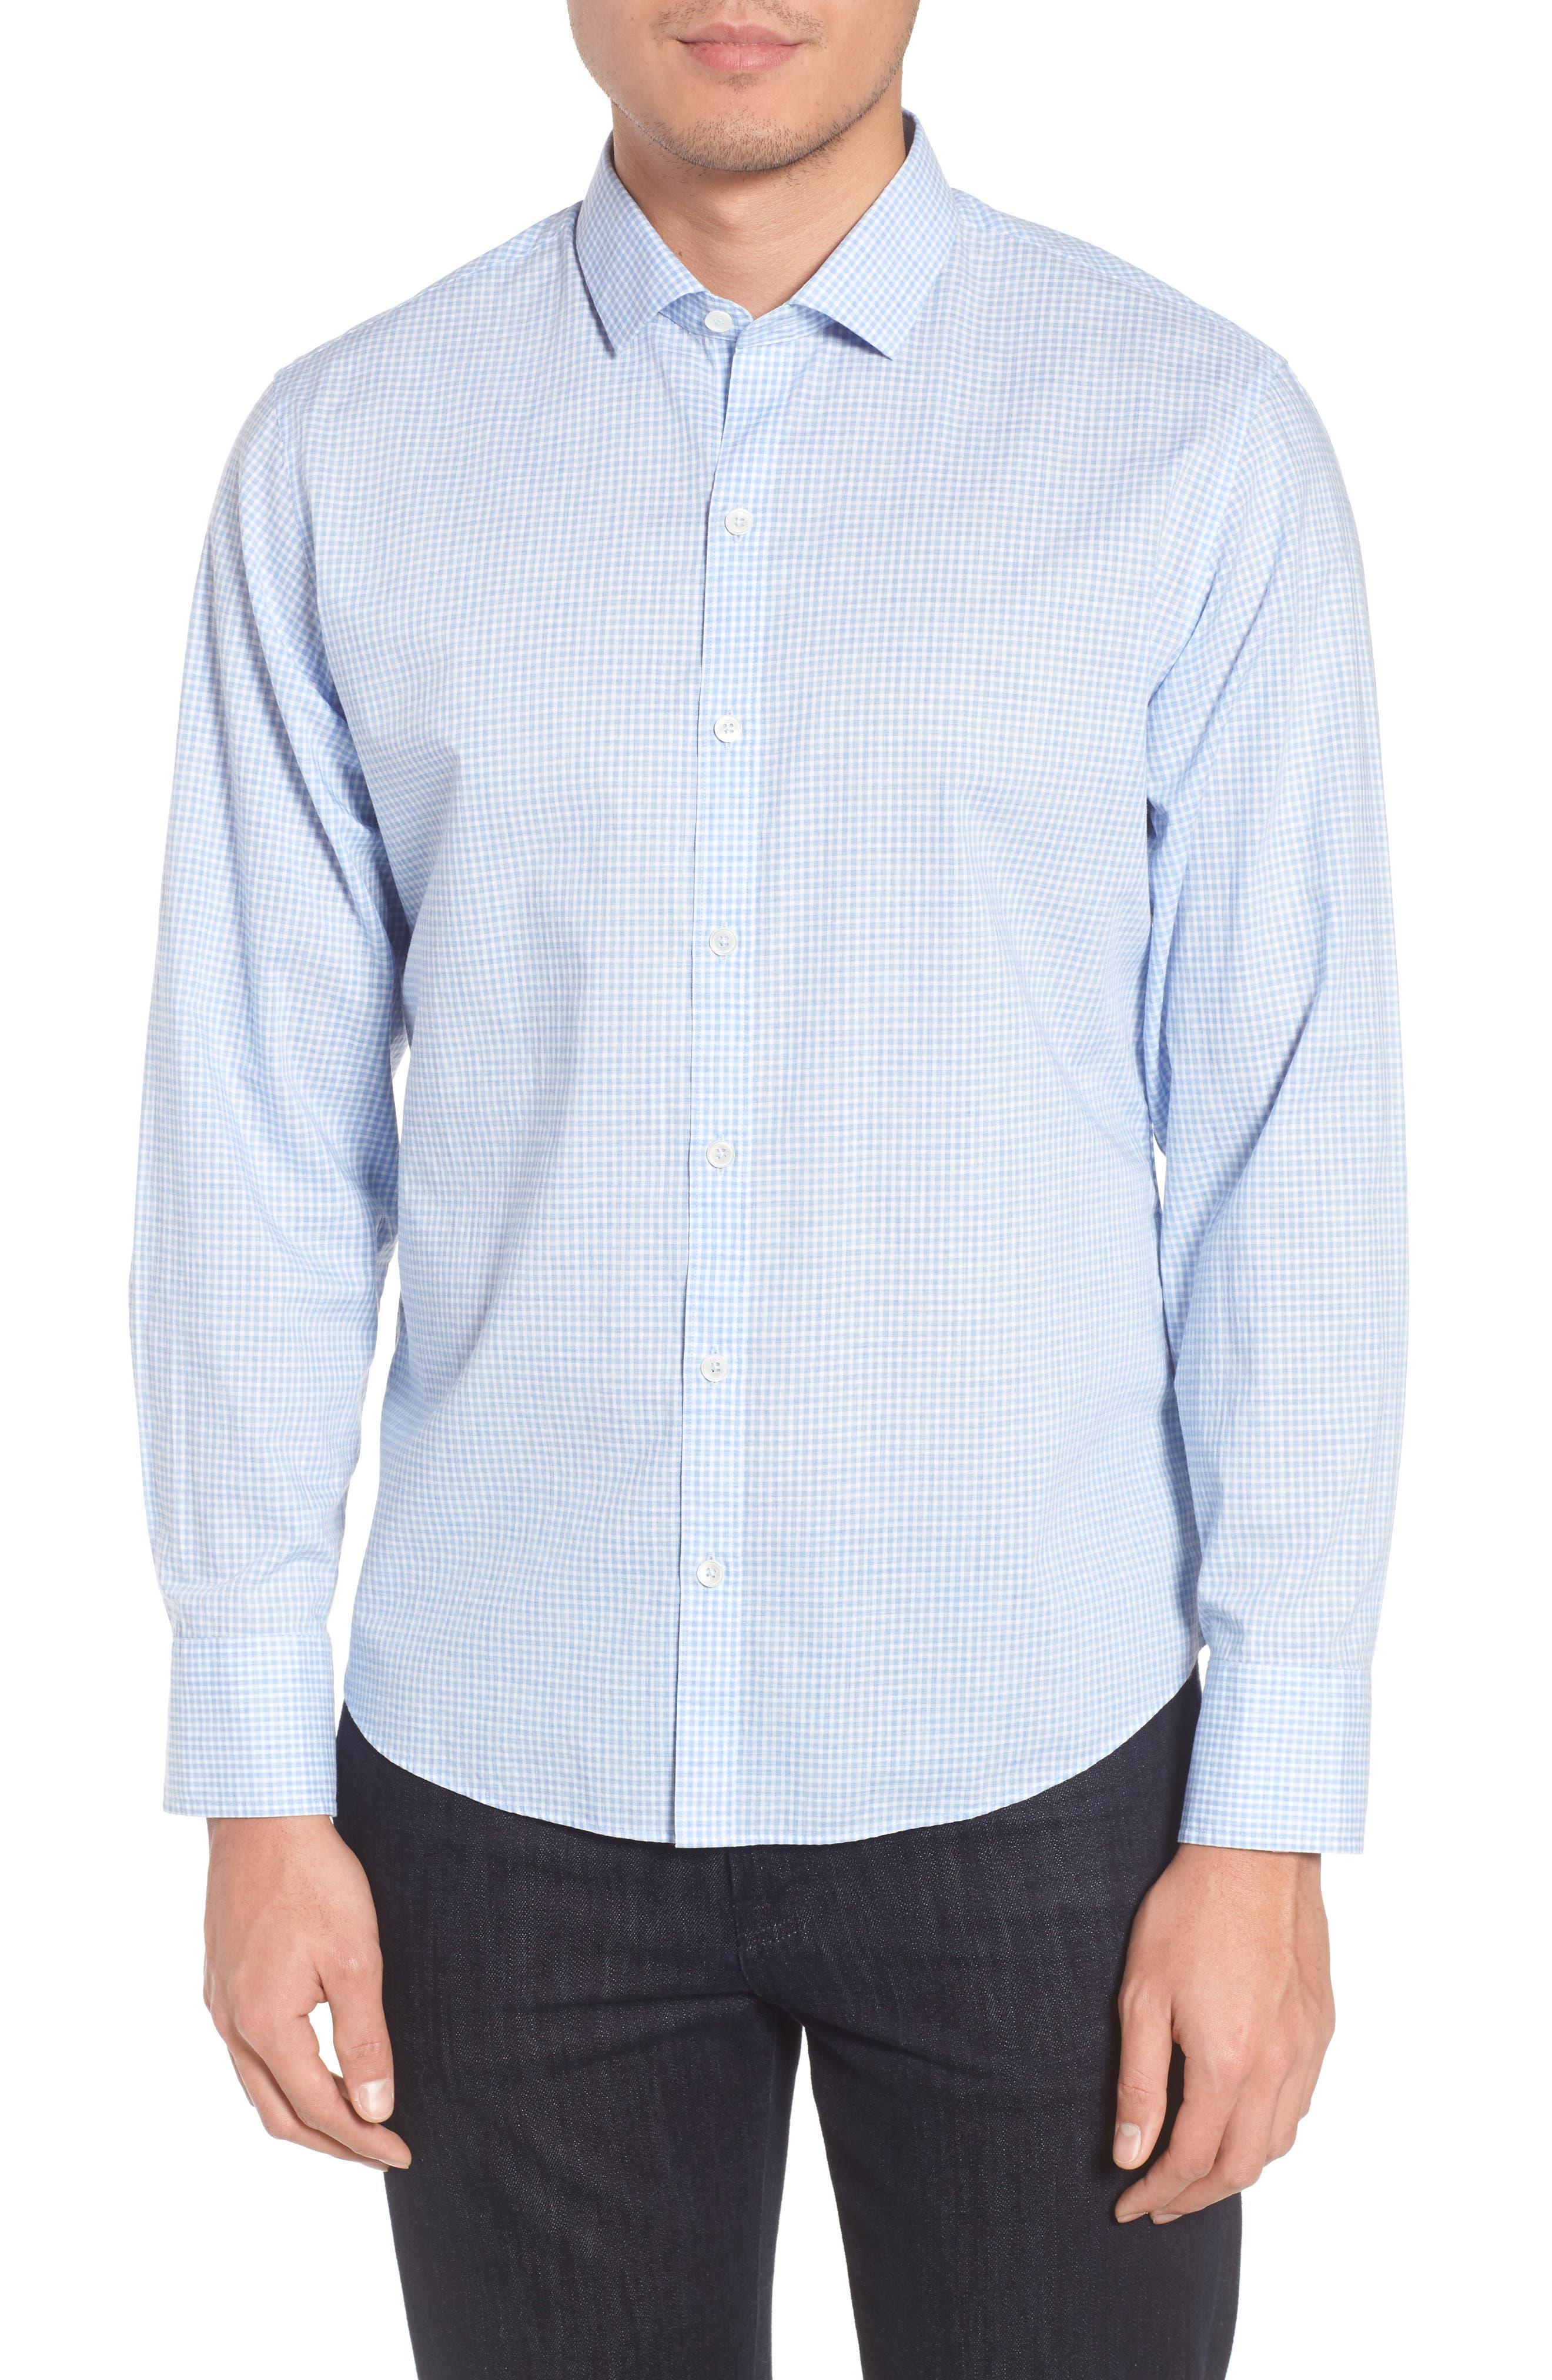 McGarry Gingham Sport Shirt,                             Main thumbnail 1, color,                             Light Blue